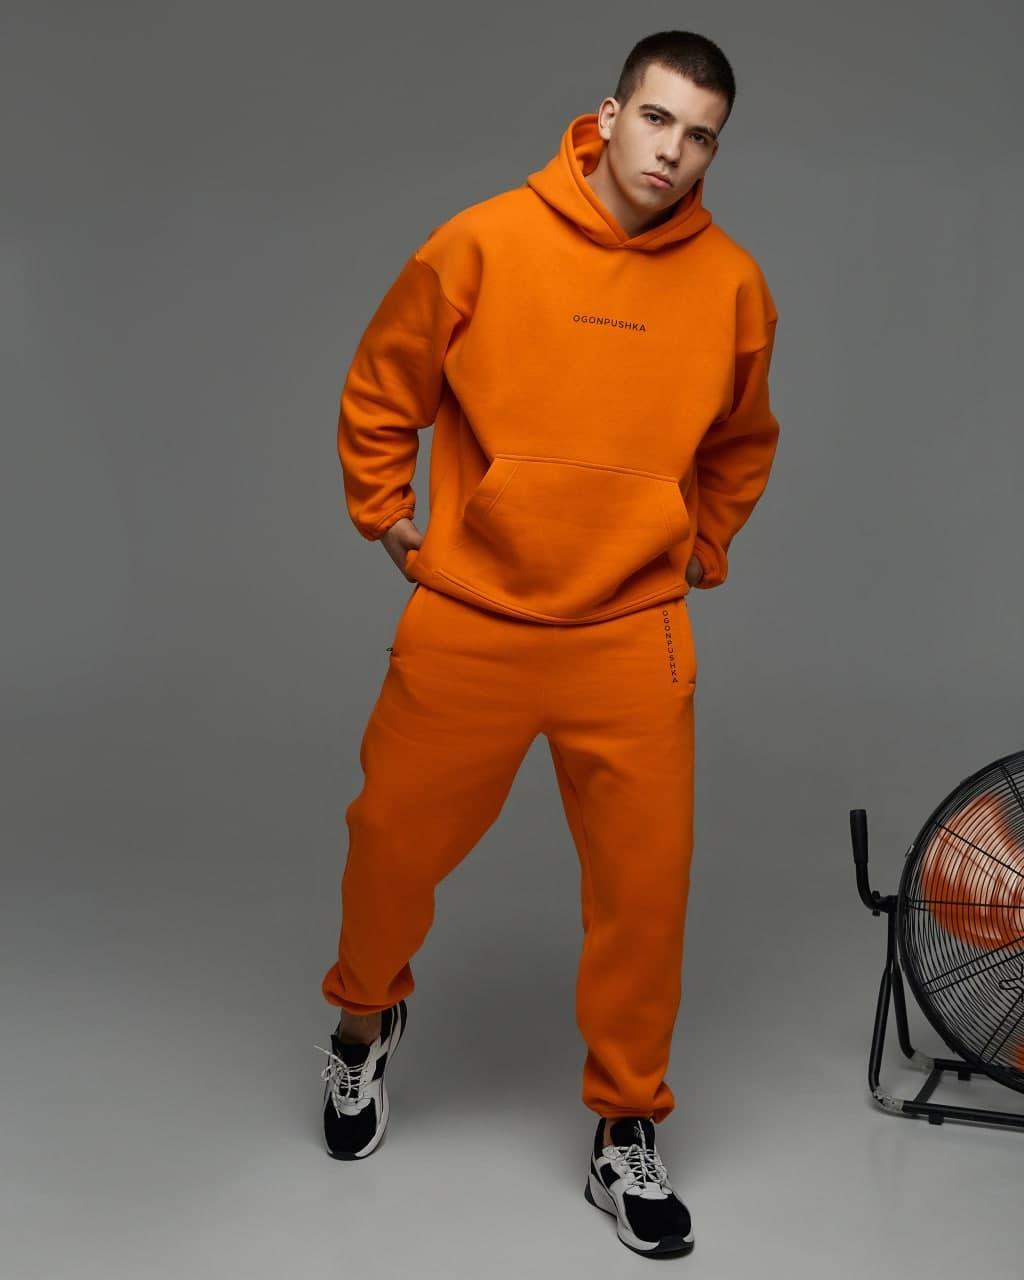 Теплый спортивный костюм оверсайз Пушка Огонь Scale оранжевый